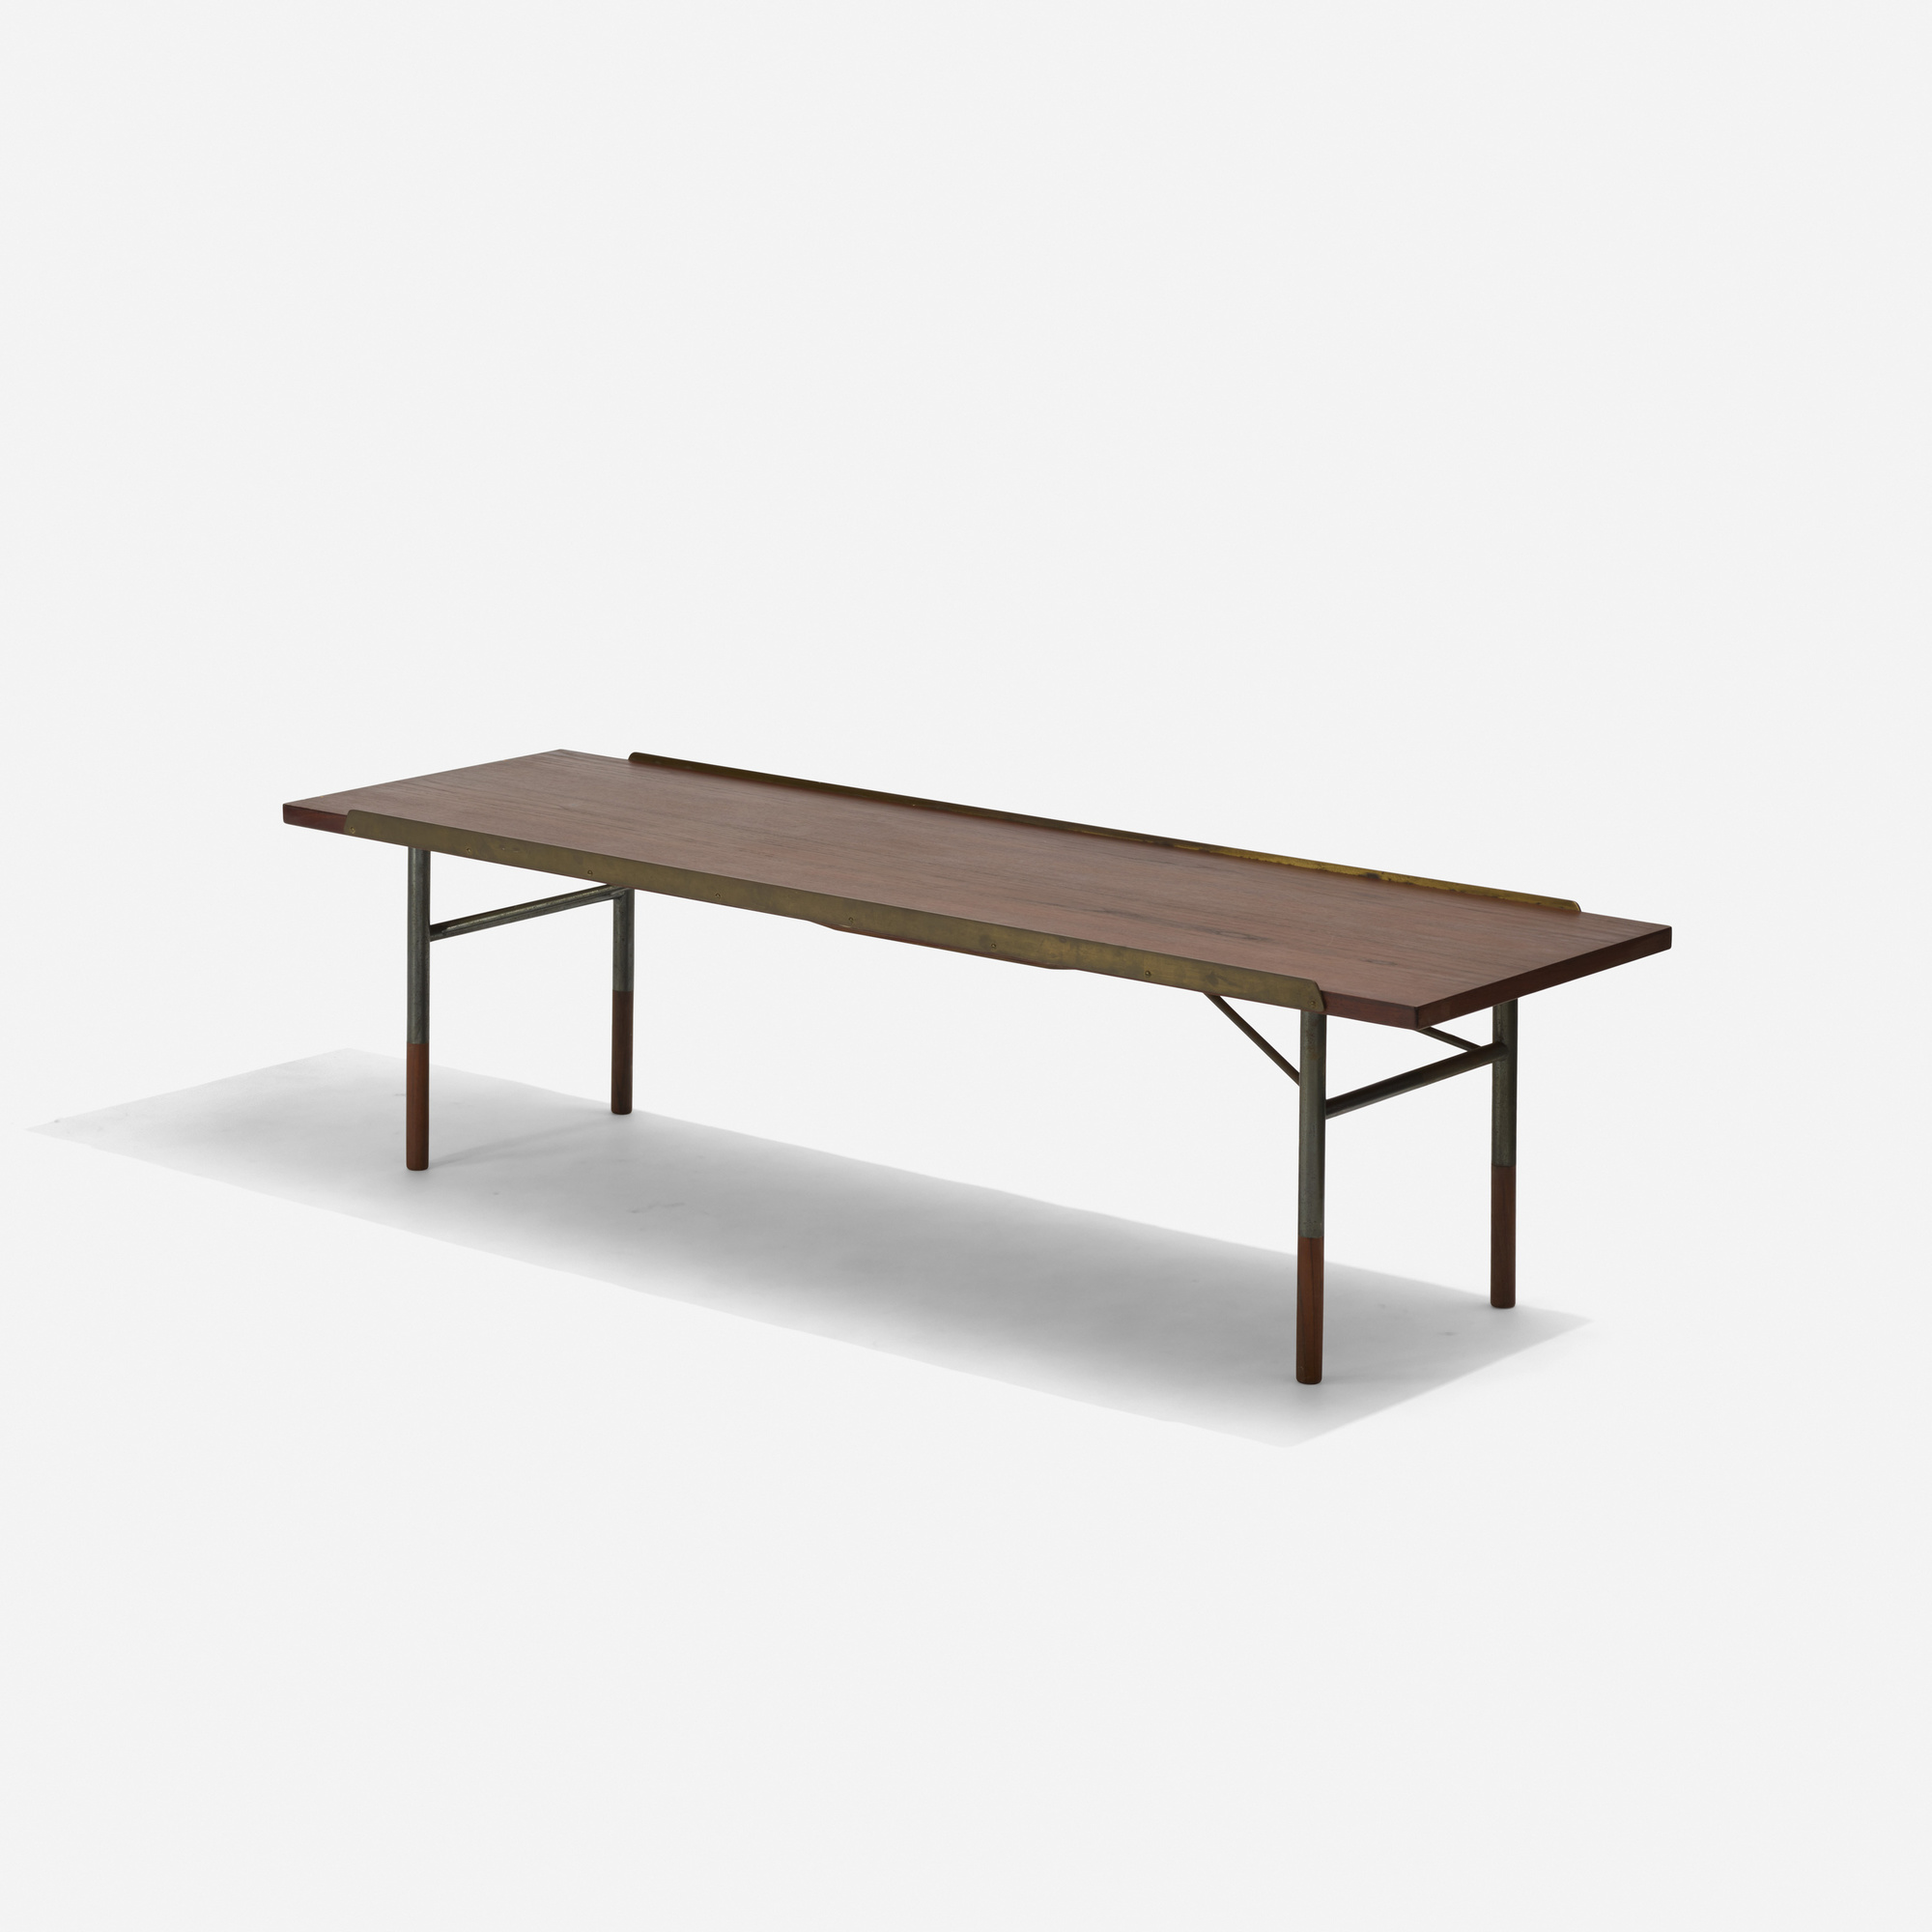 271: Finn Juhl / bench (1 of 2)